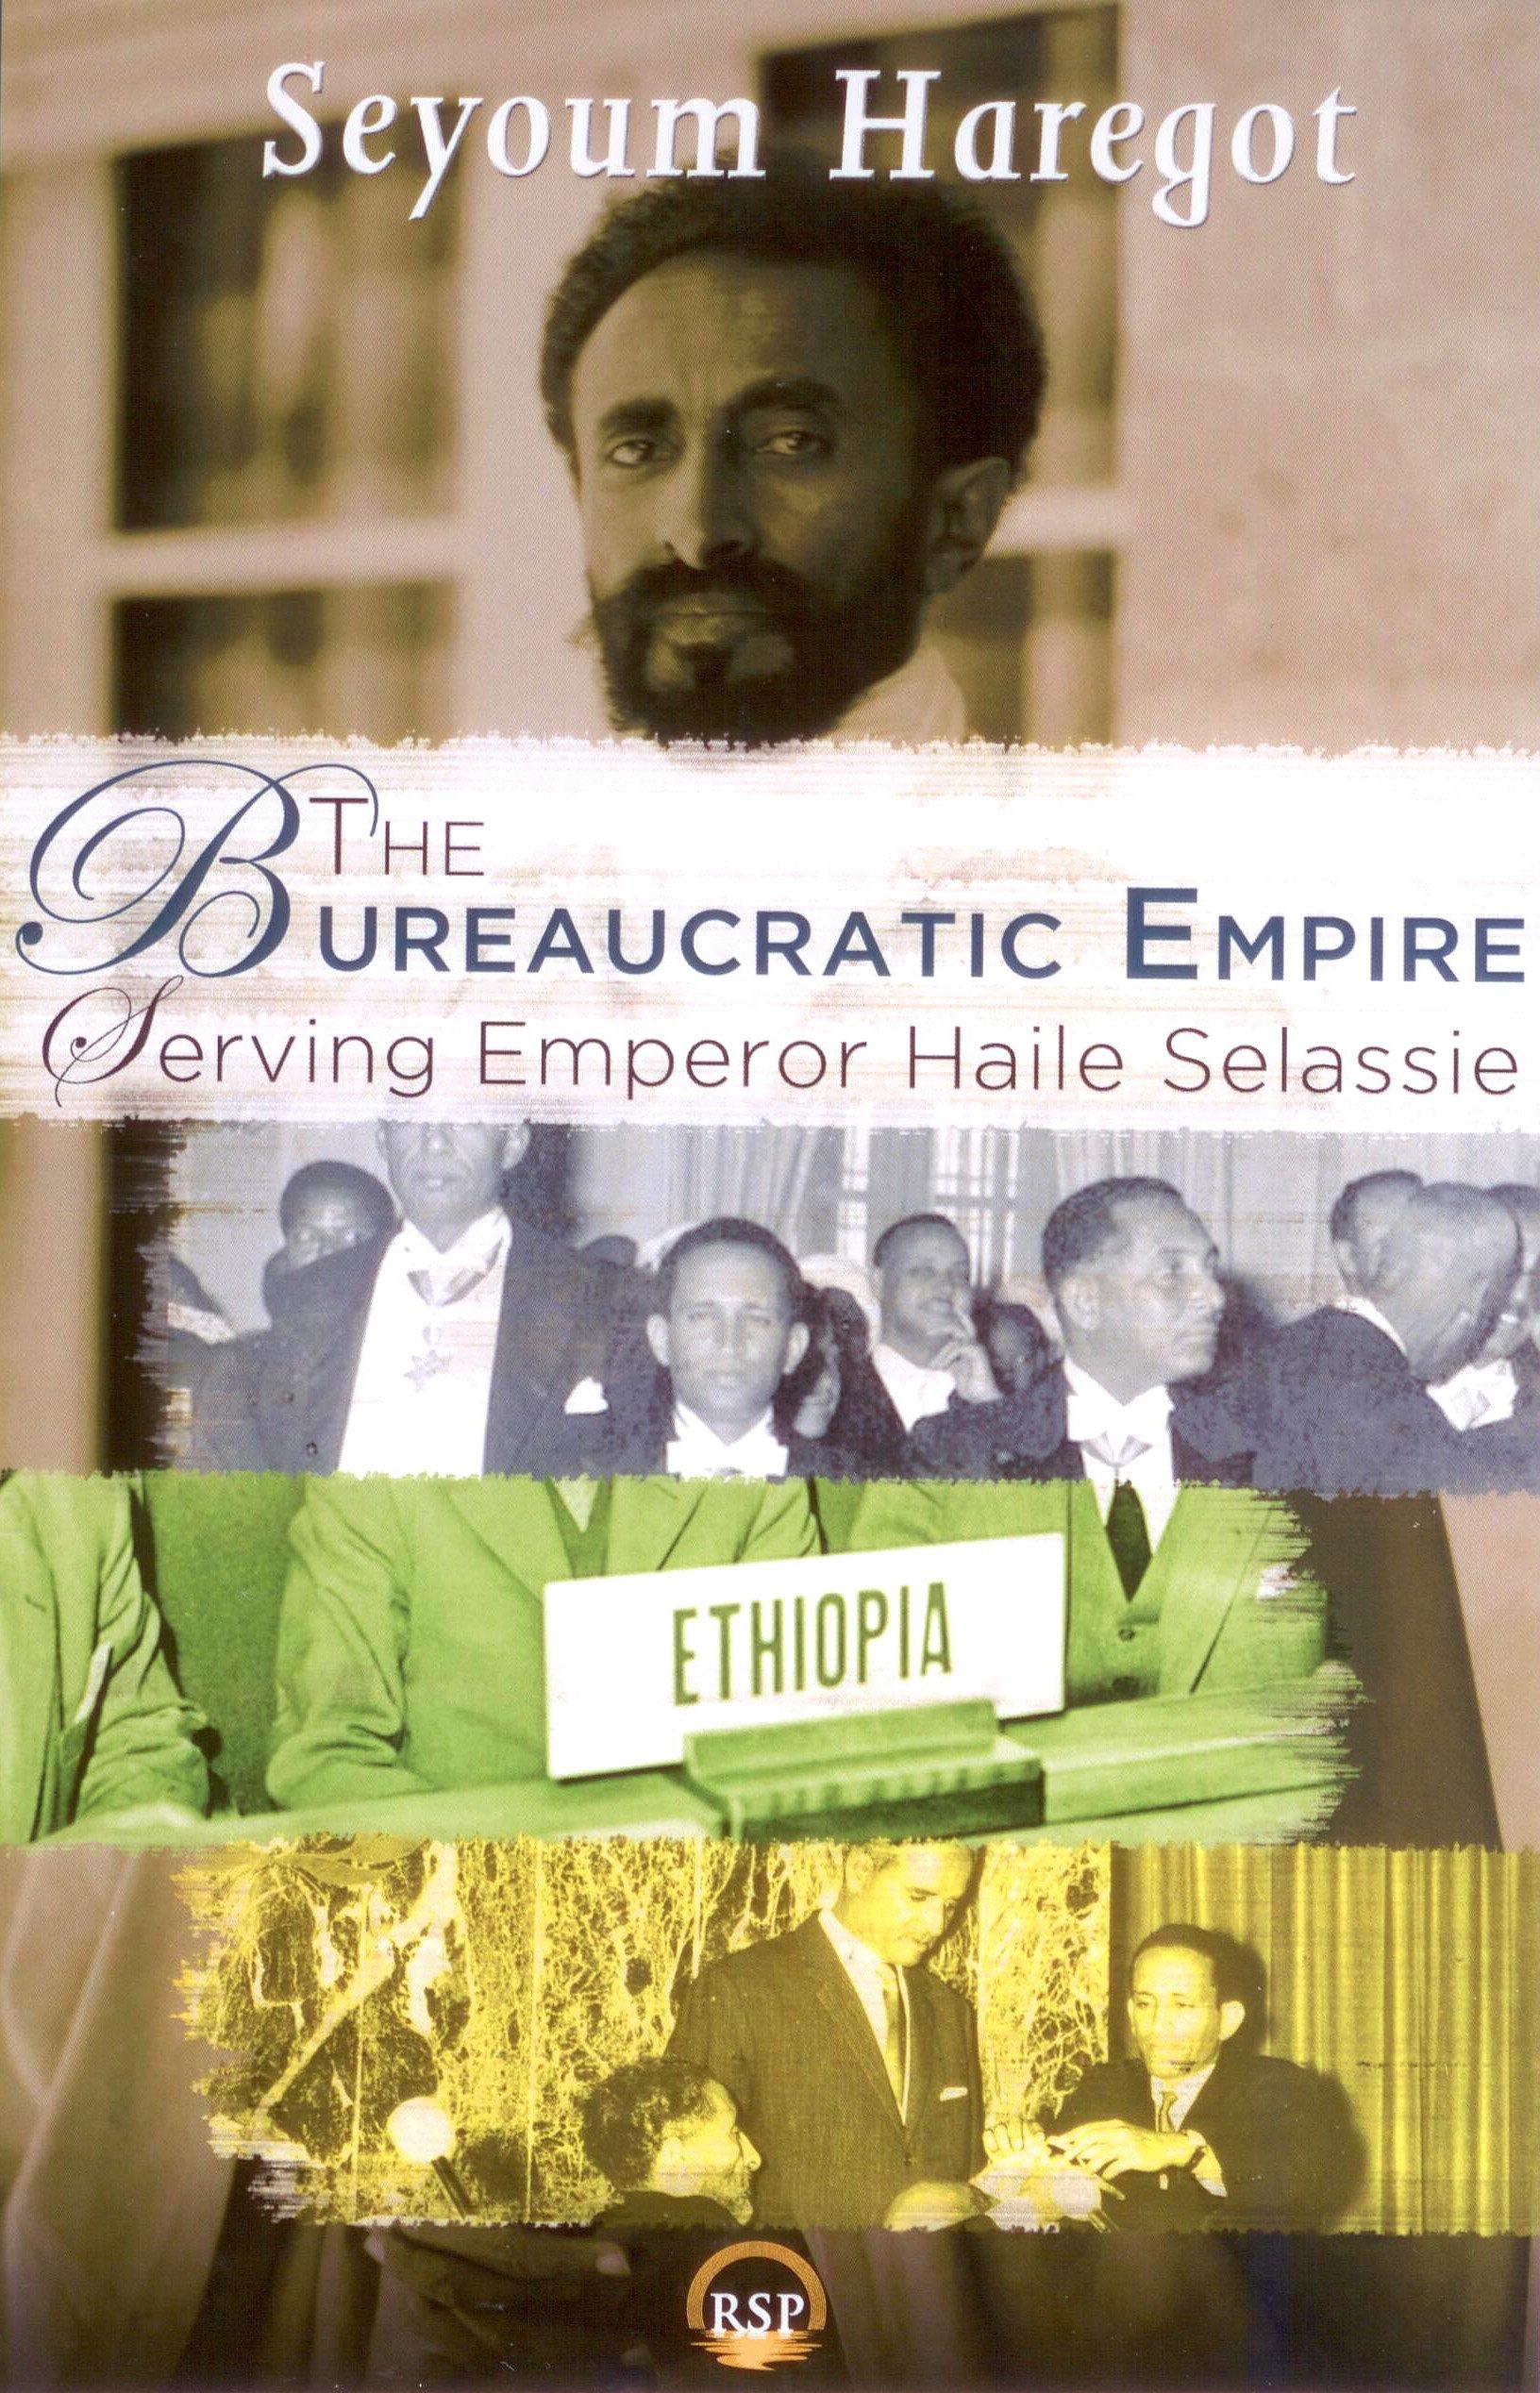 The bureaucratic empire serving emperor haile selassie seyoum a haregot 9781569023631 amazon com books